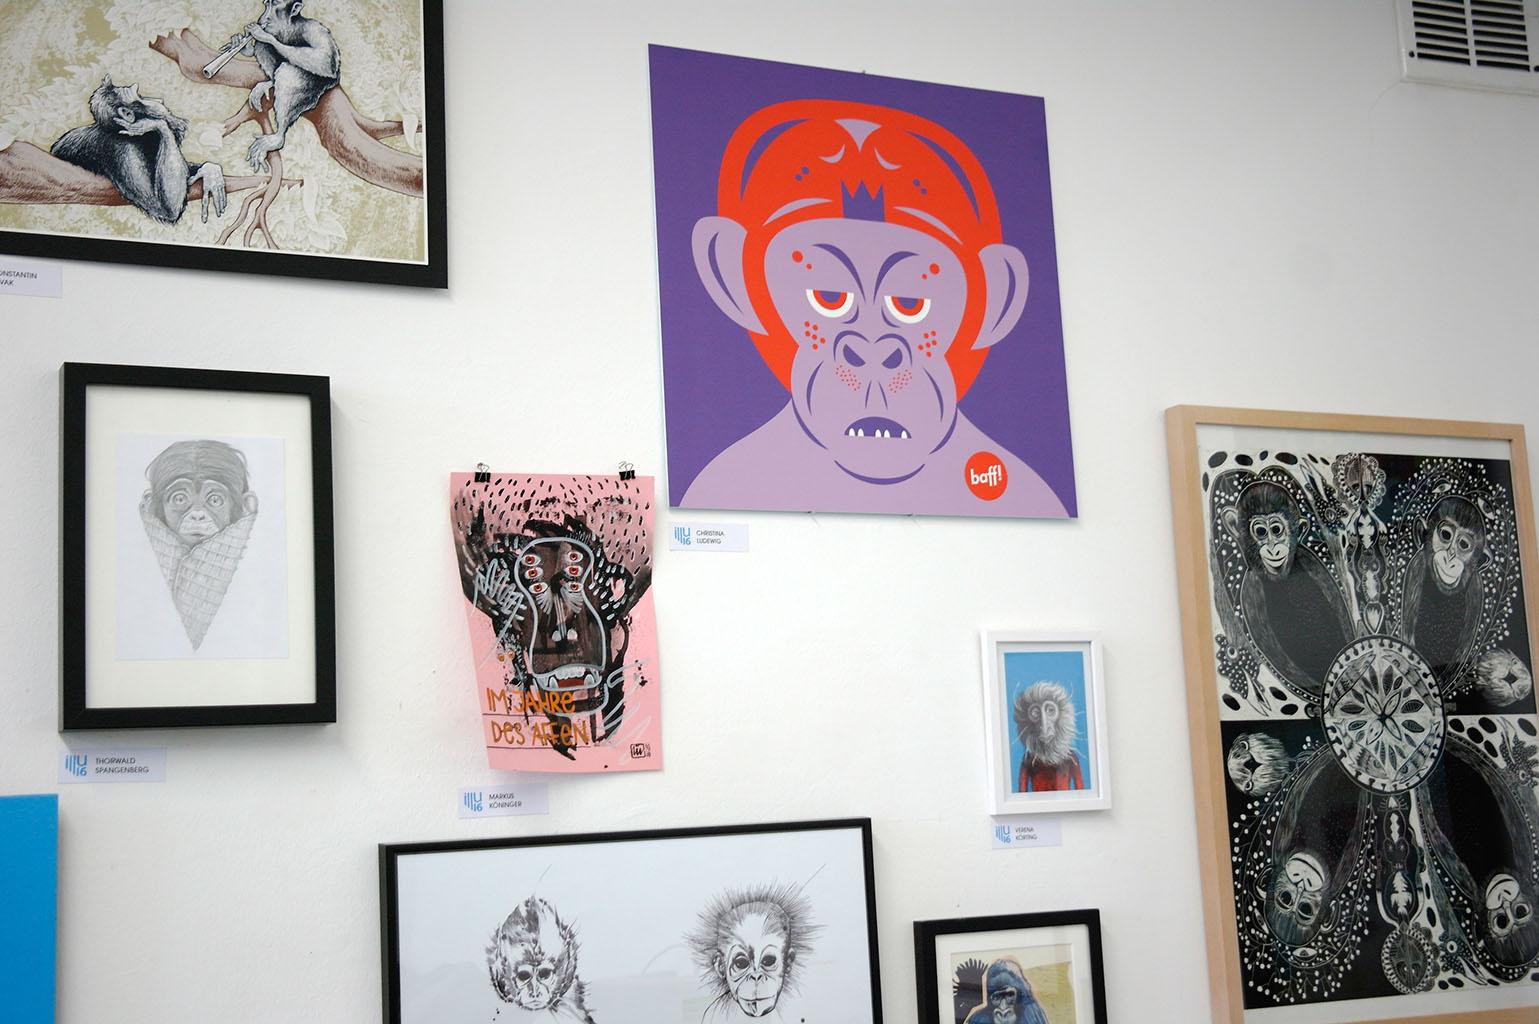 illu16-illustratoren-festival-köln-affe-hans-christian-sanladerer